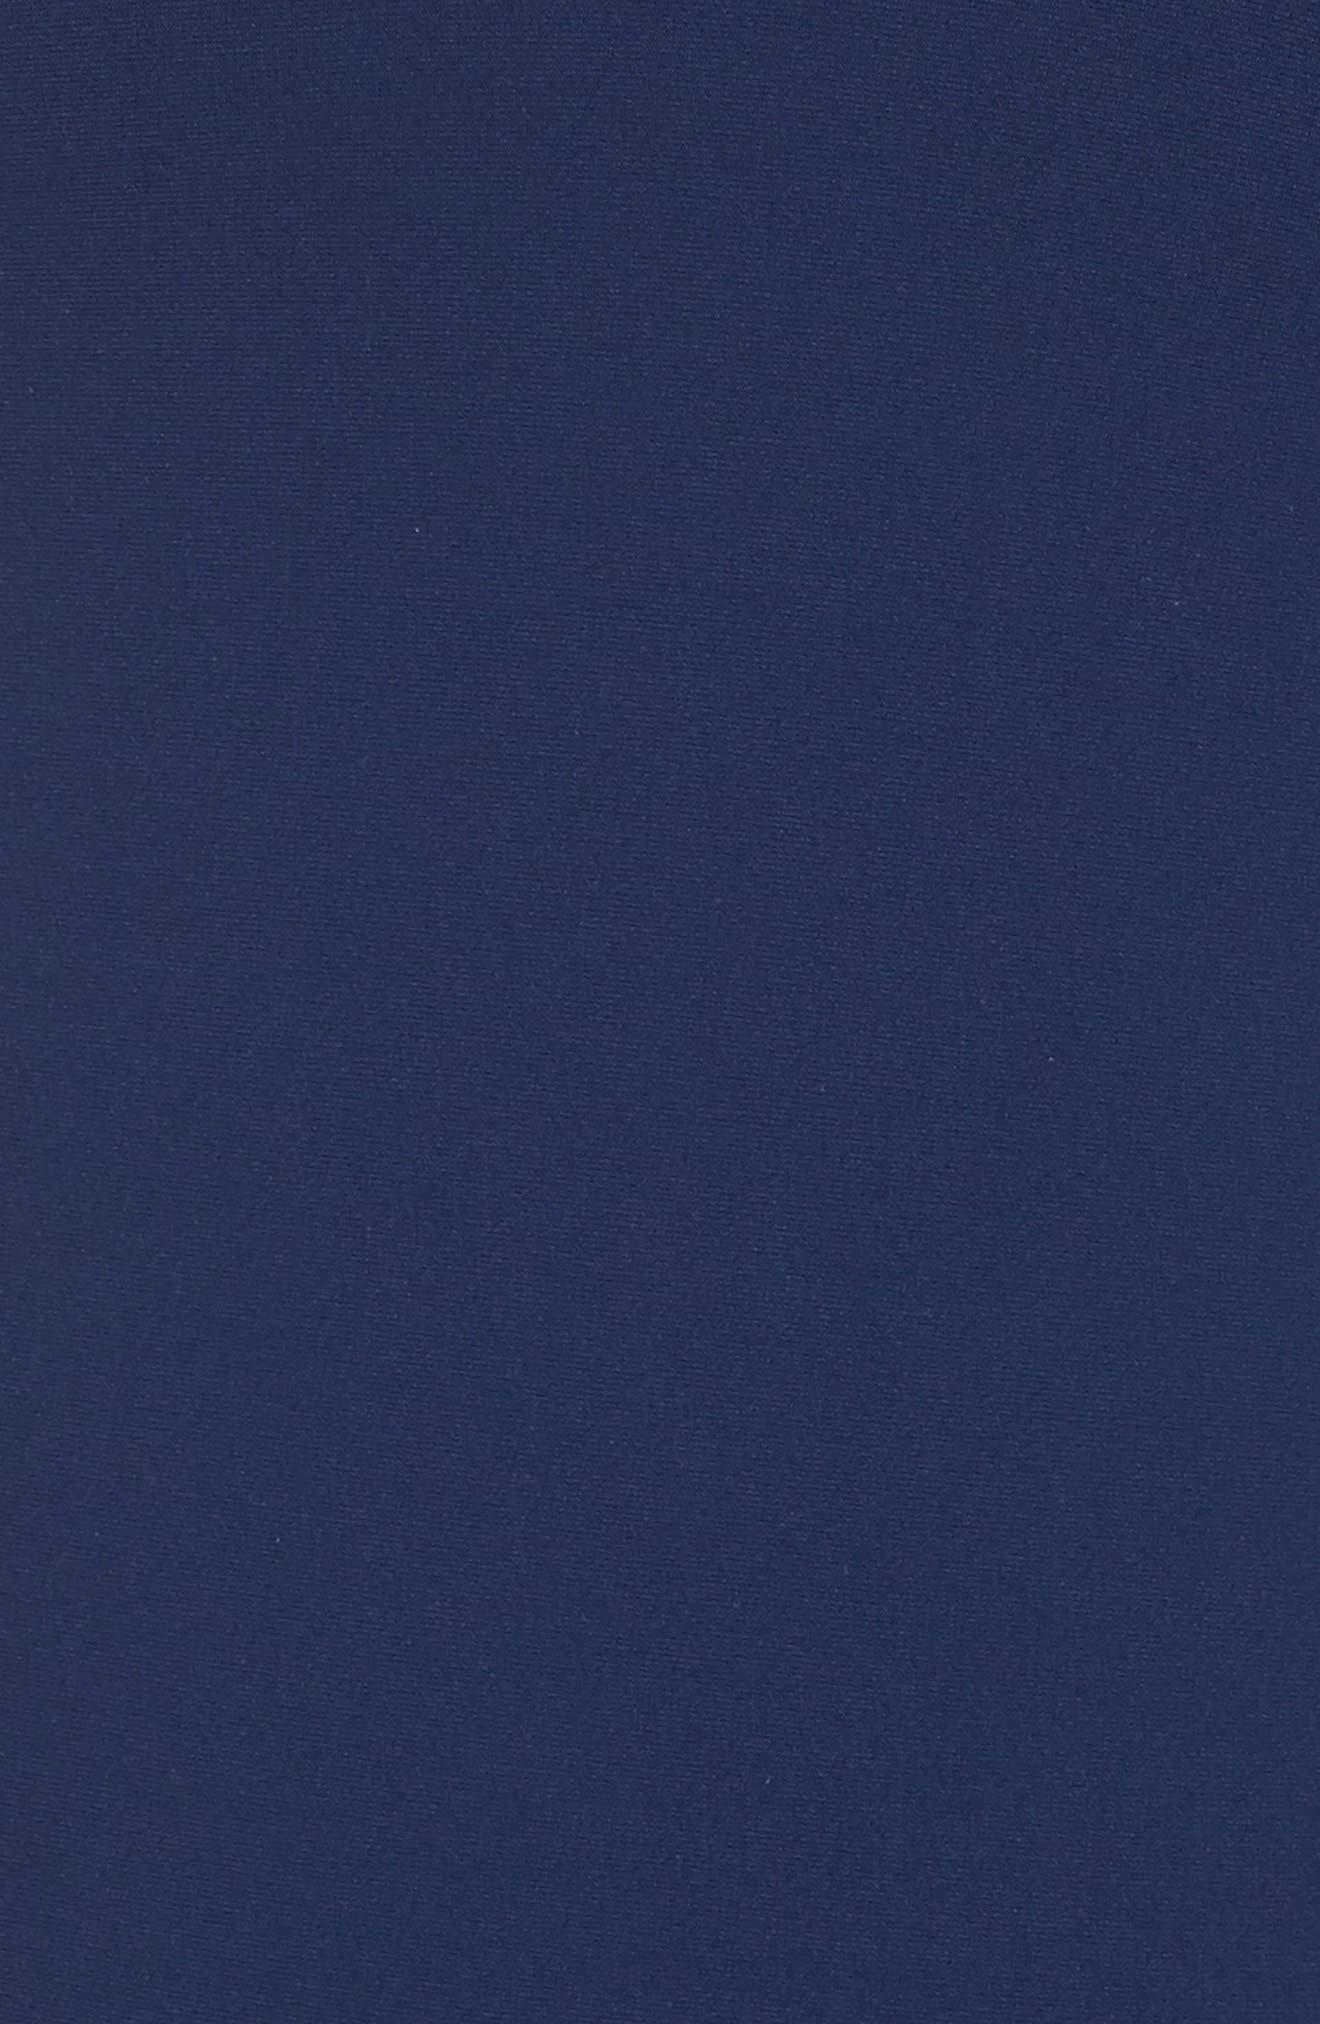 Farrah One-Piece Swimsuit,                             Alternate thumbnail 5, color,                             Starlight Blue